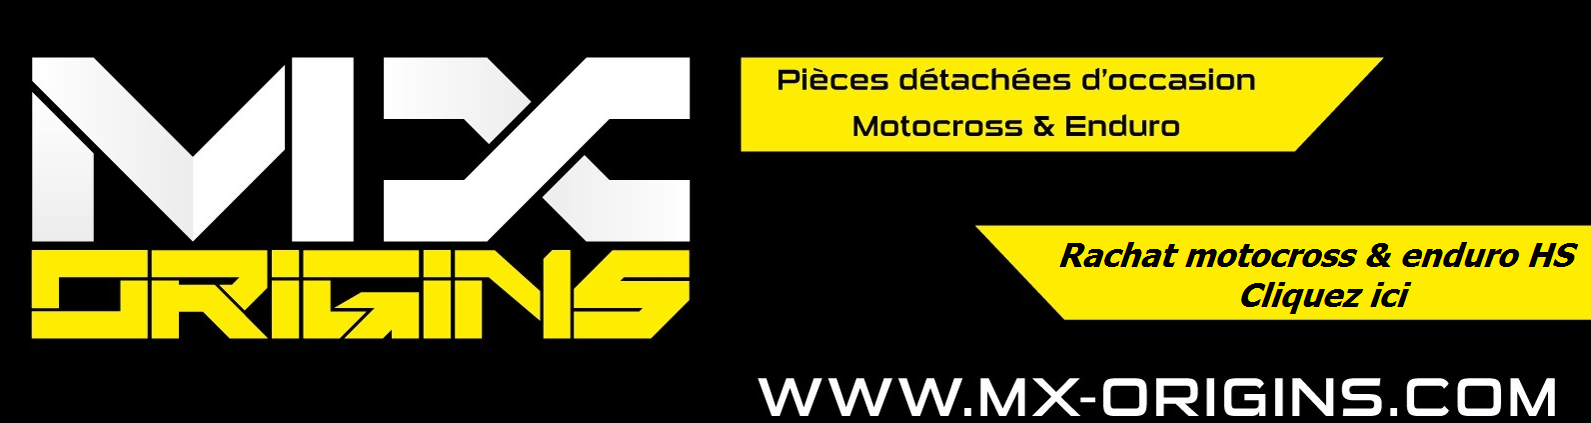 Rachat Motocross & Enduro HS